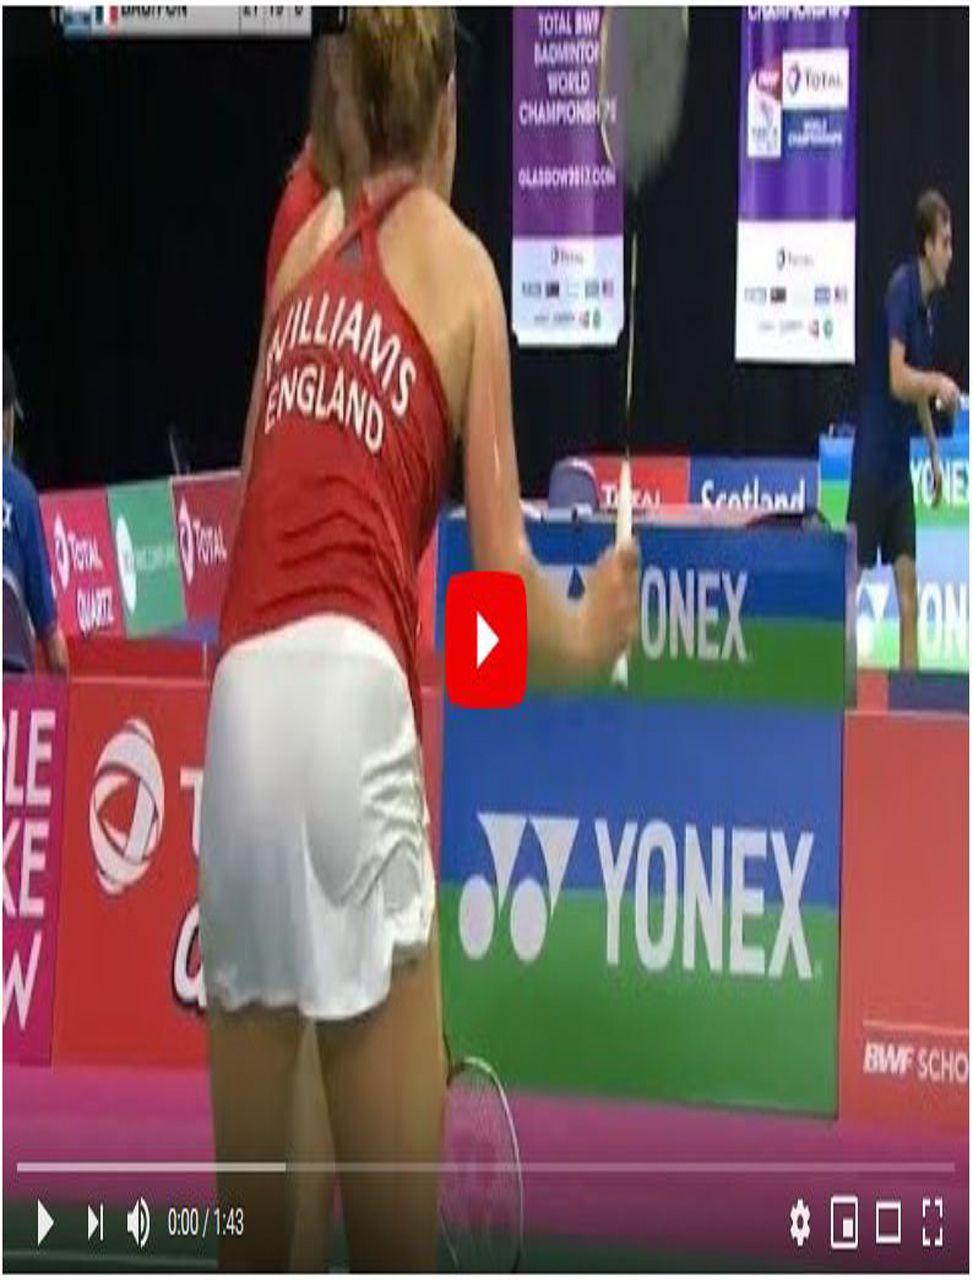 Viki Williams Onex Youtube Gym Shorts Womens